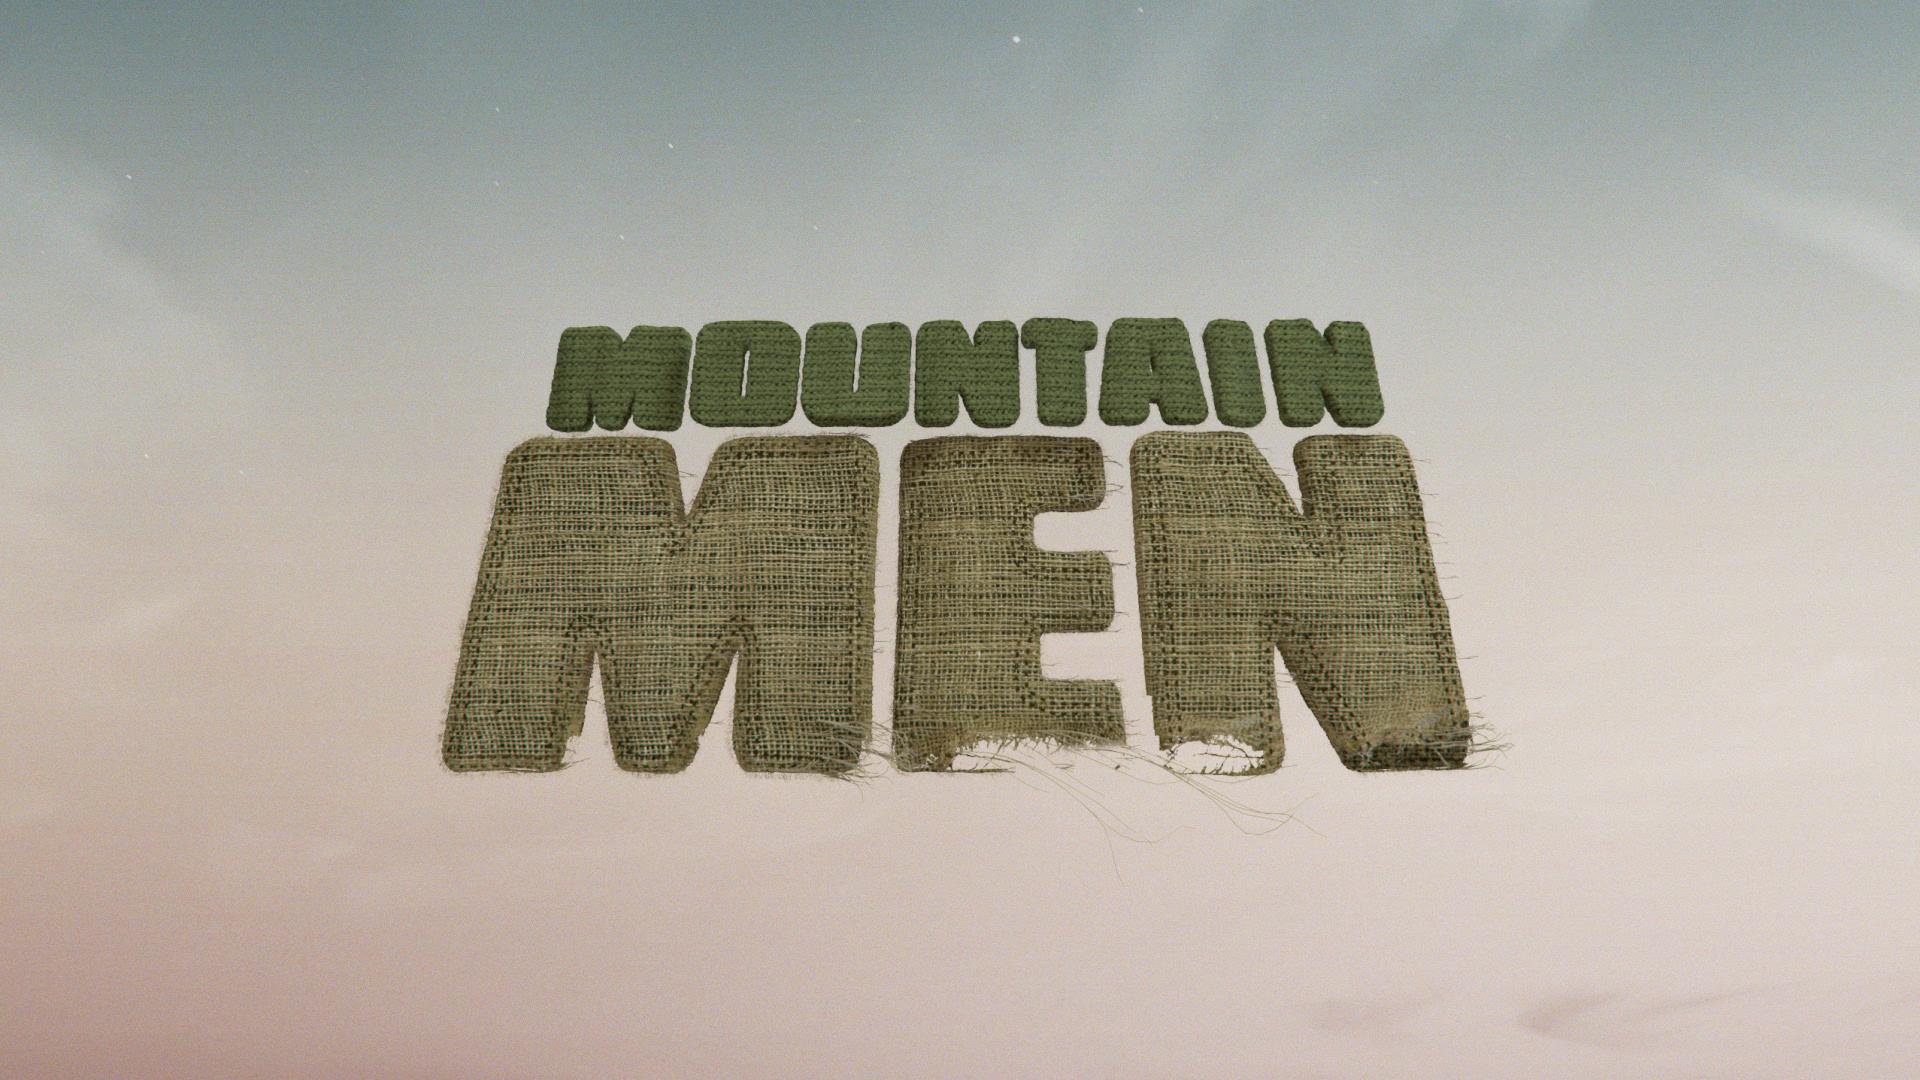 MountainMen0.jpg